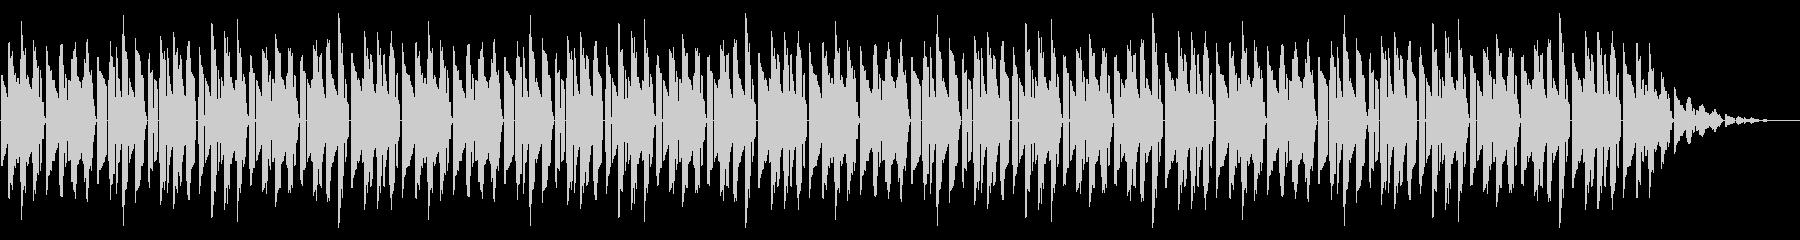 GB系風和風ゲームのED曲の未再生の波形